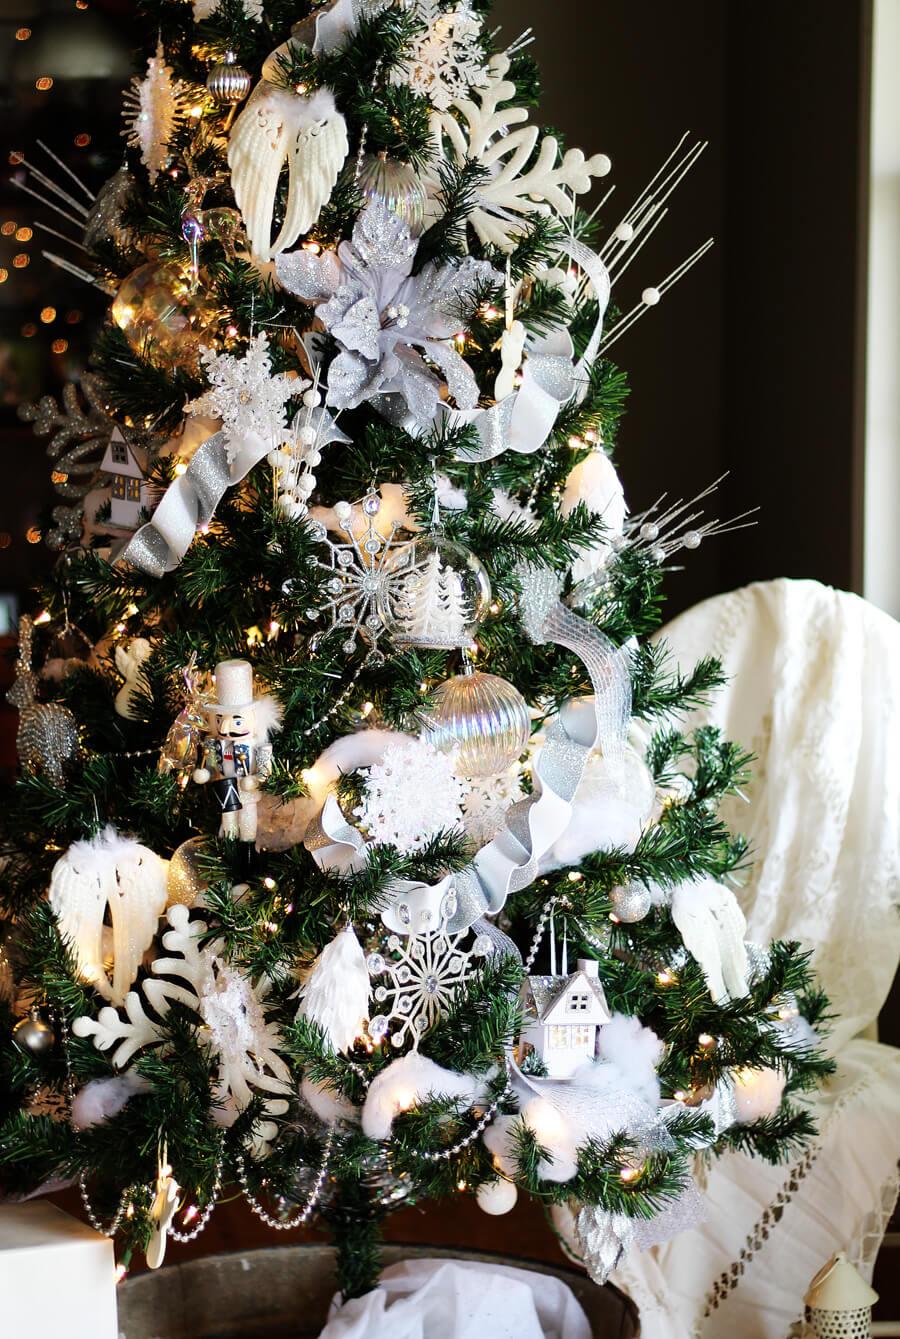 White Christmas Tree Theme.Winter White Christmas Tree Decorating Ideas Buy This Cook